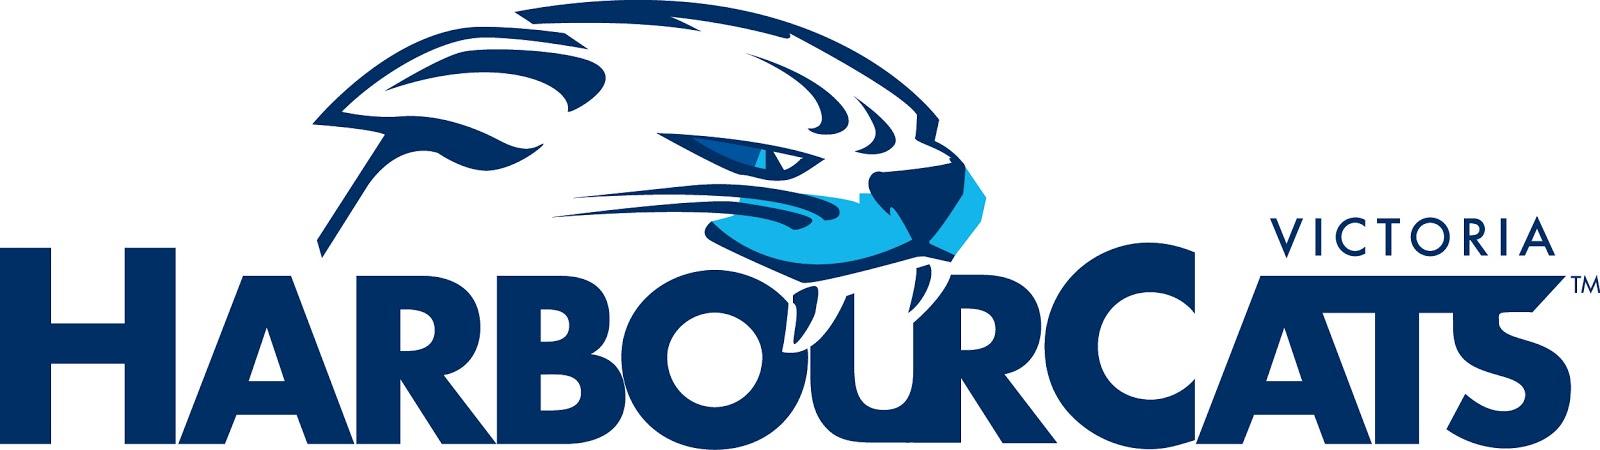 Victoria  HarbourCats Logo Primary Logo (2013-Pres) -  SportsLogos.Net